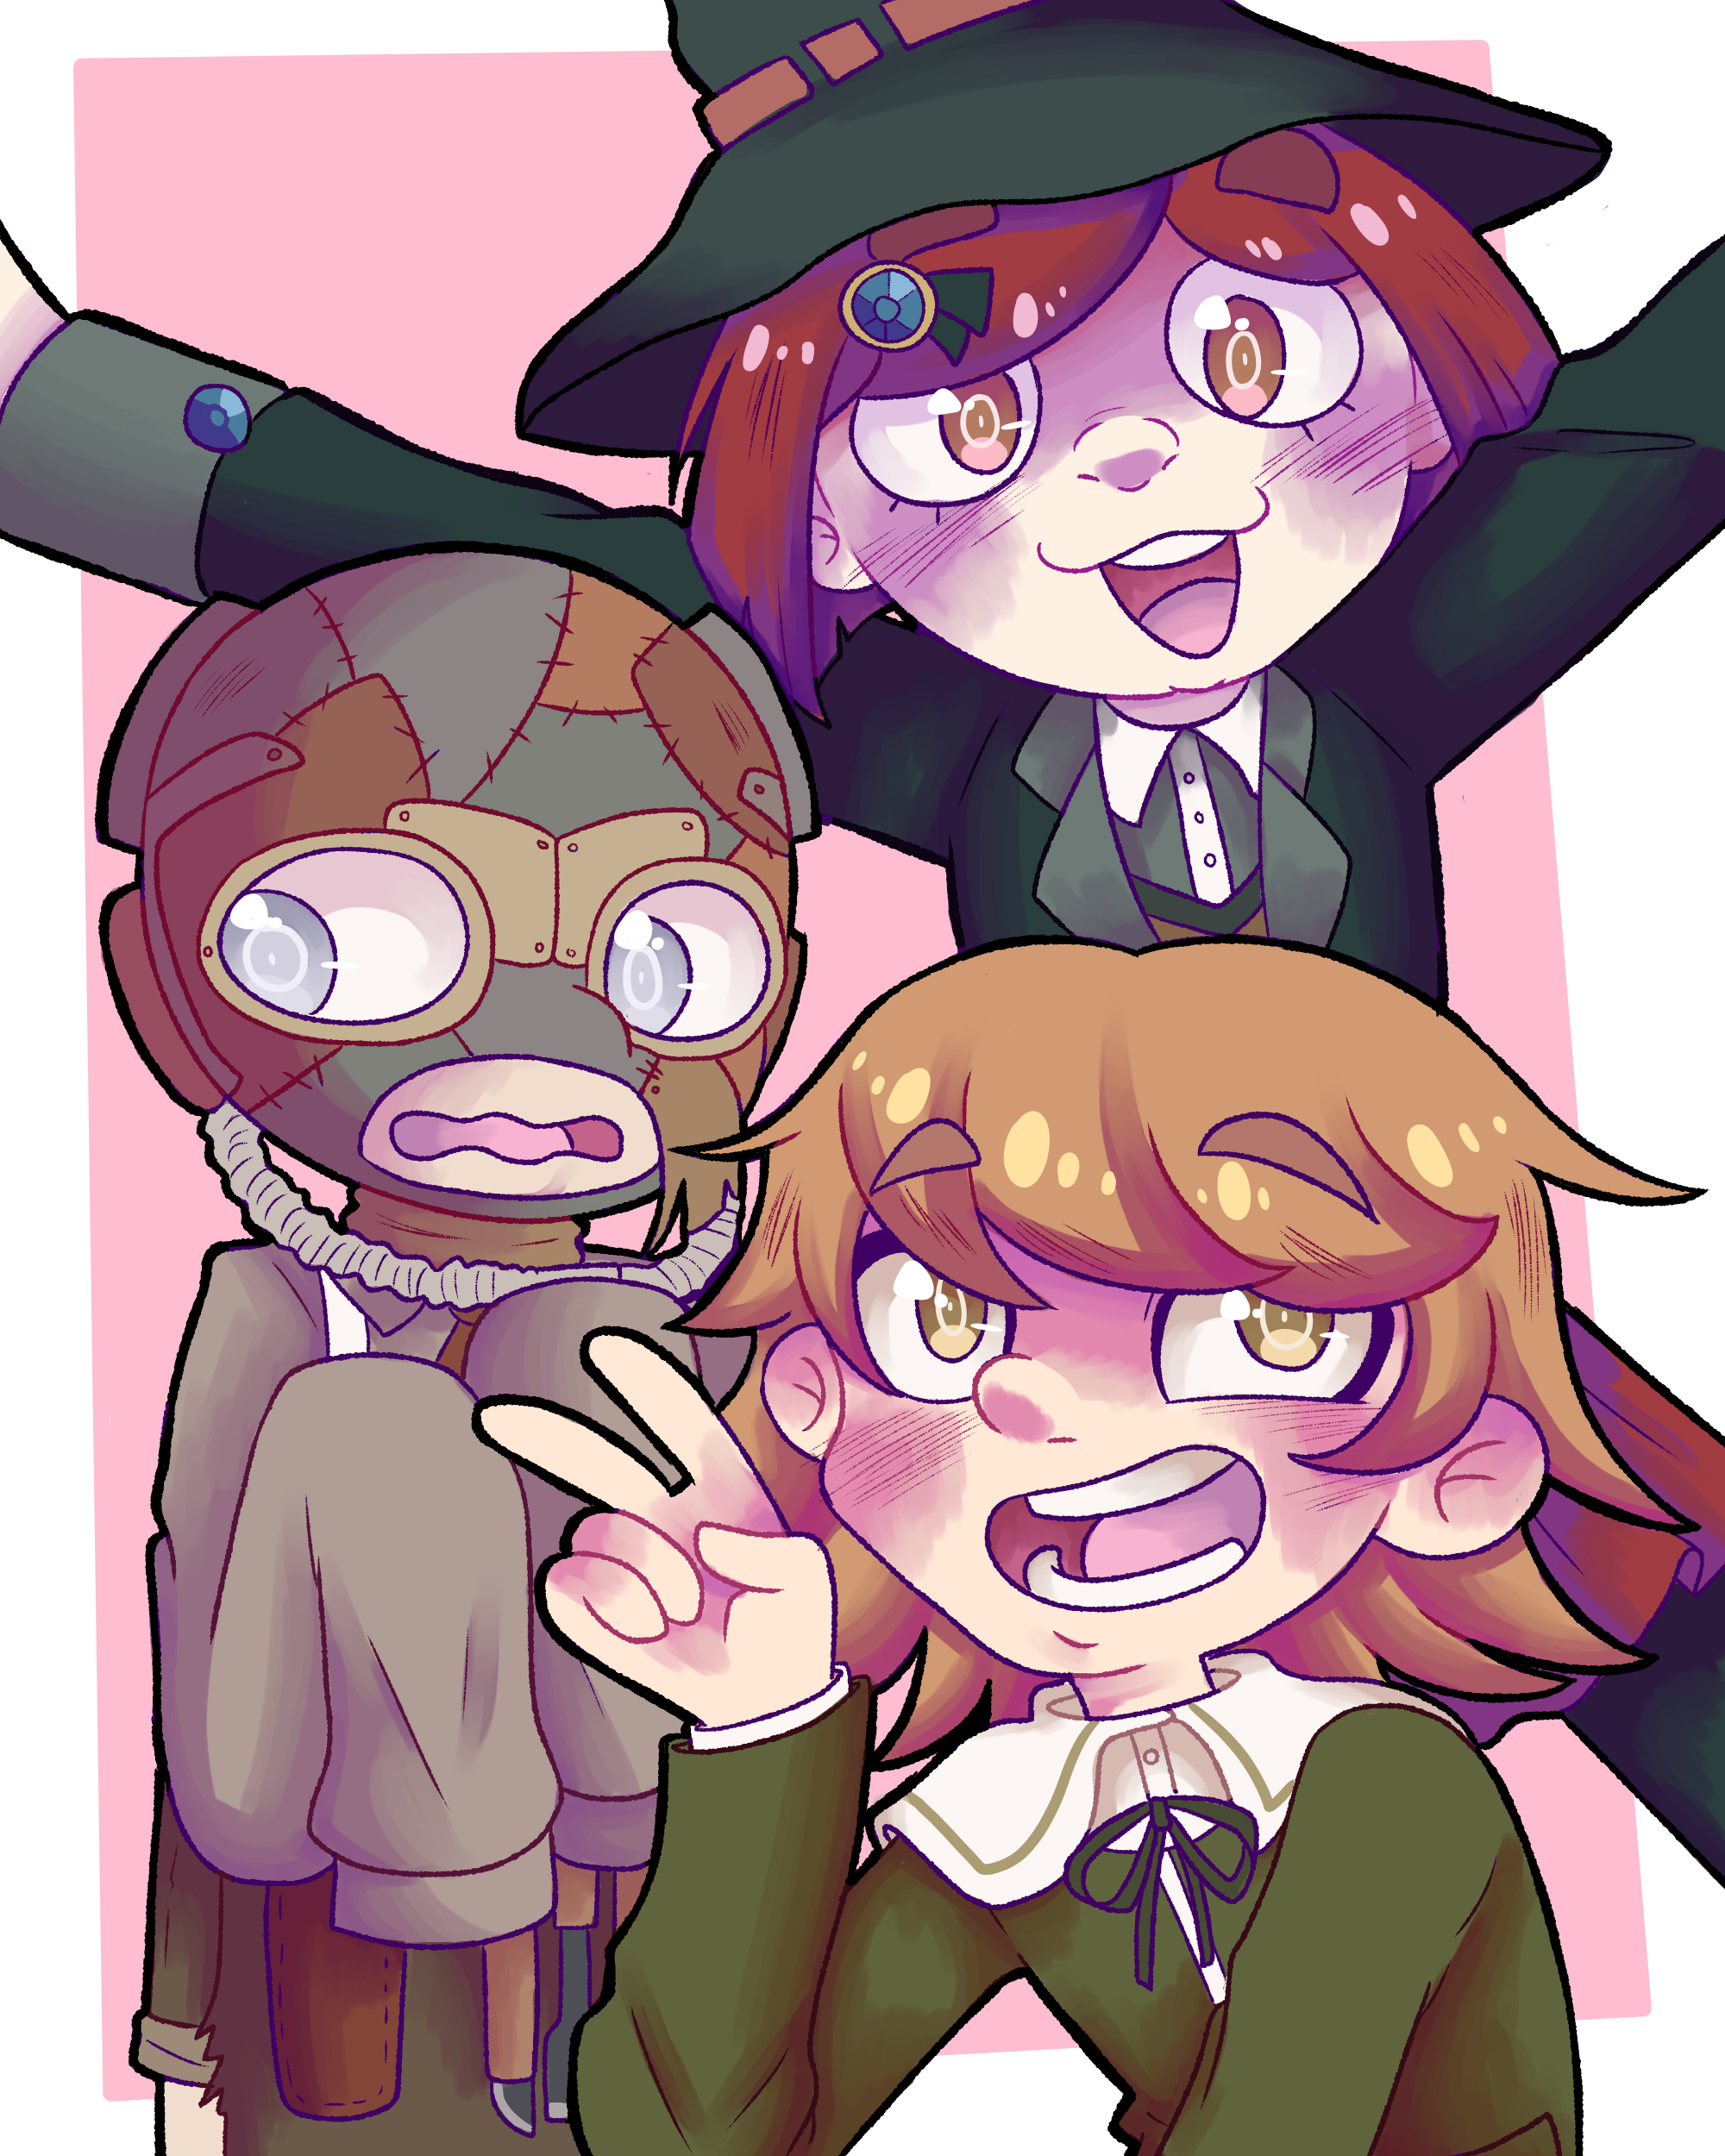 Danganronpa trio